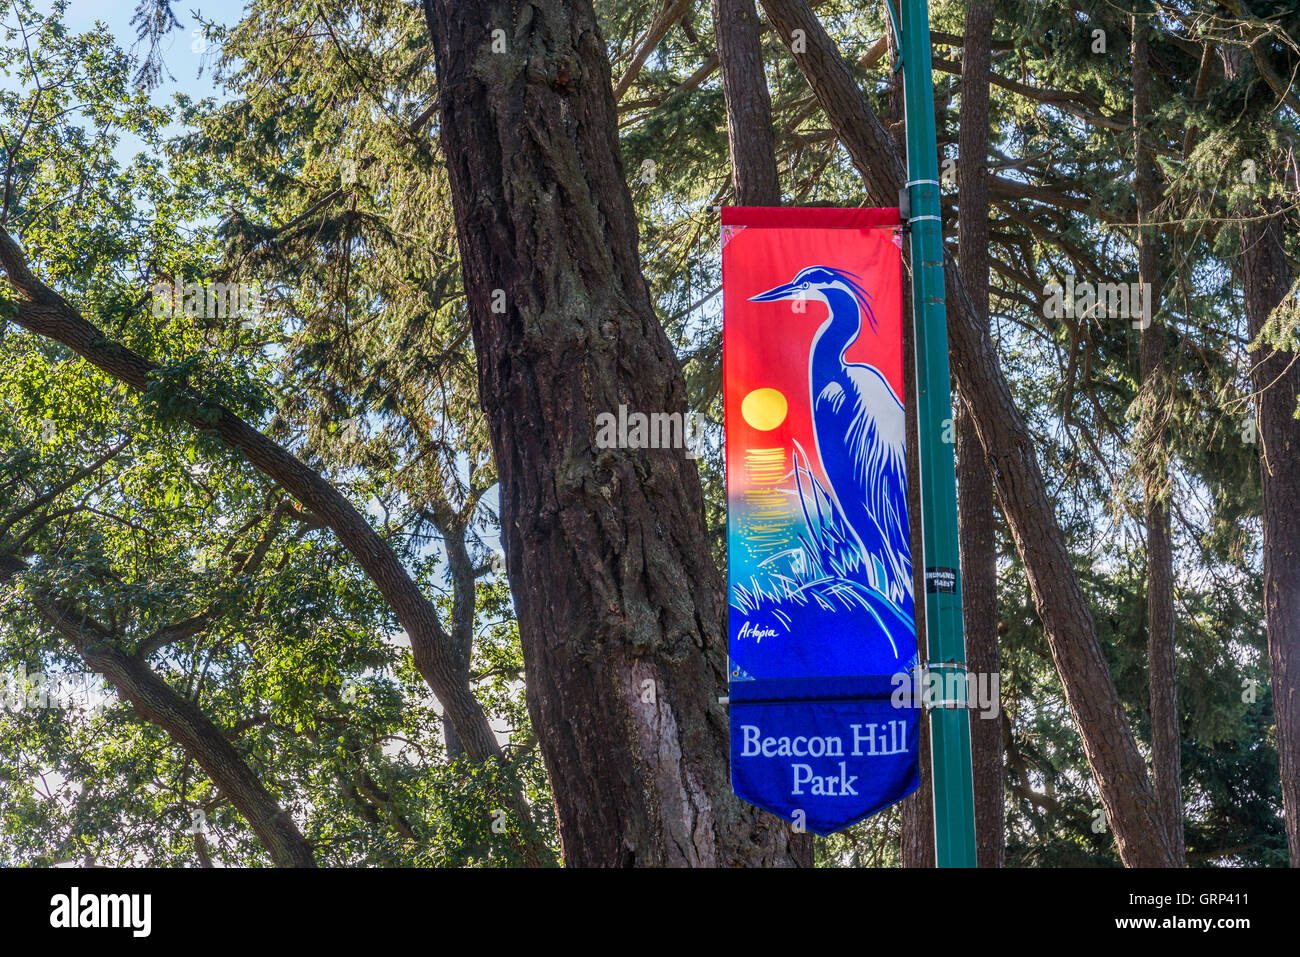 Beacon Hill Park banner, Victoria, British Columbia, Canadá Imagen De Stock